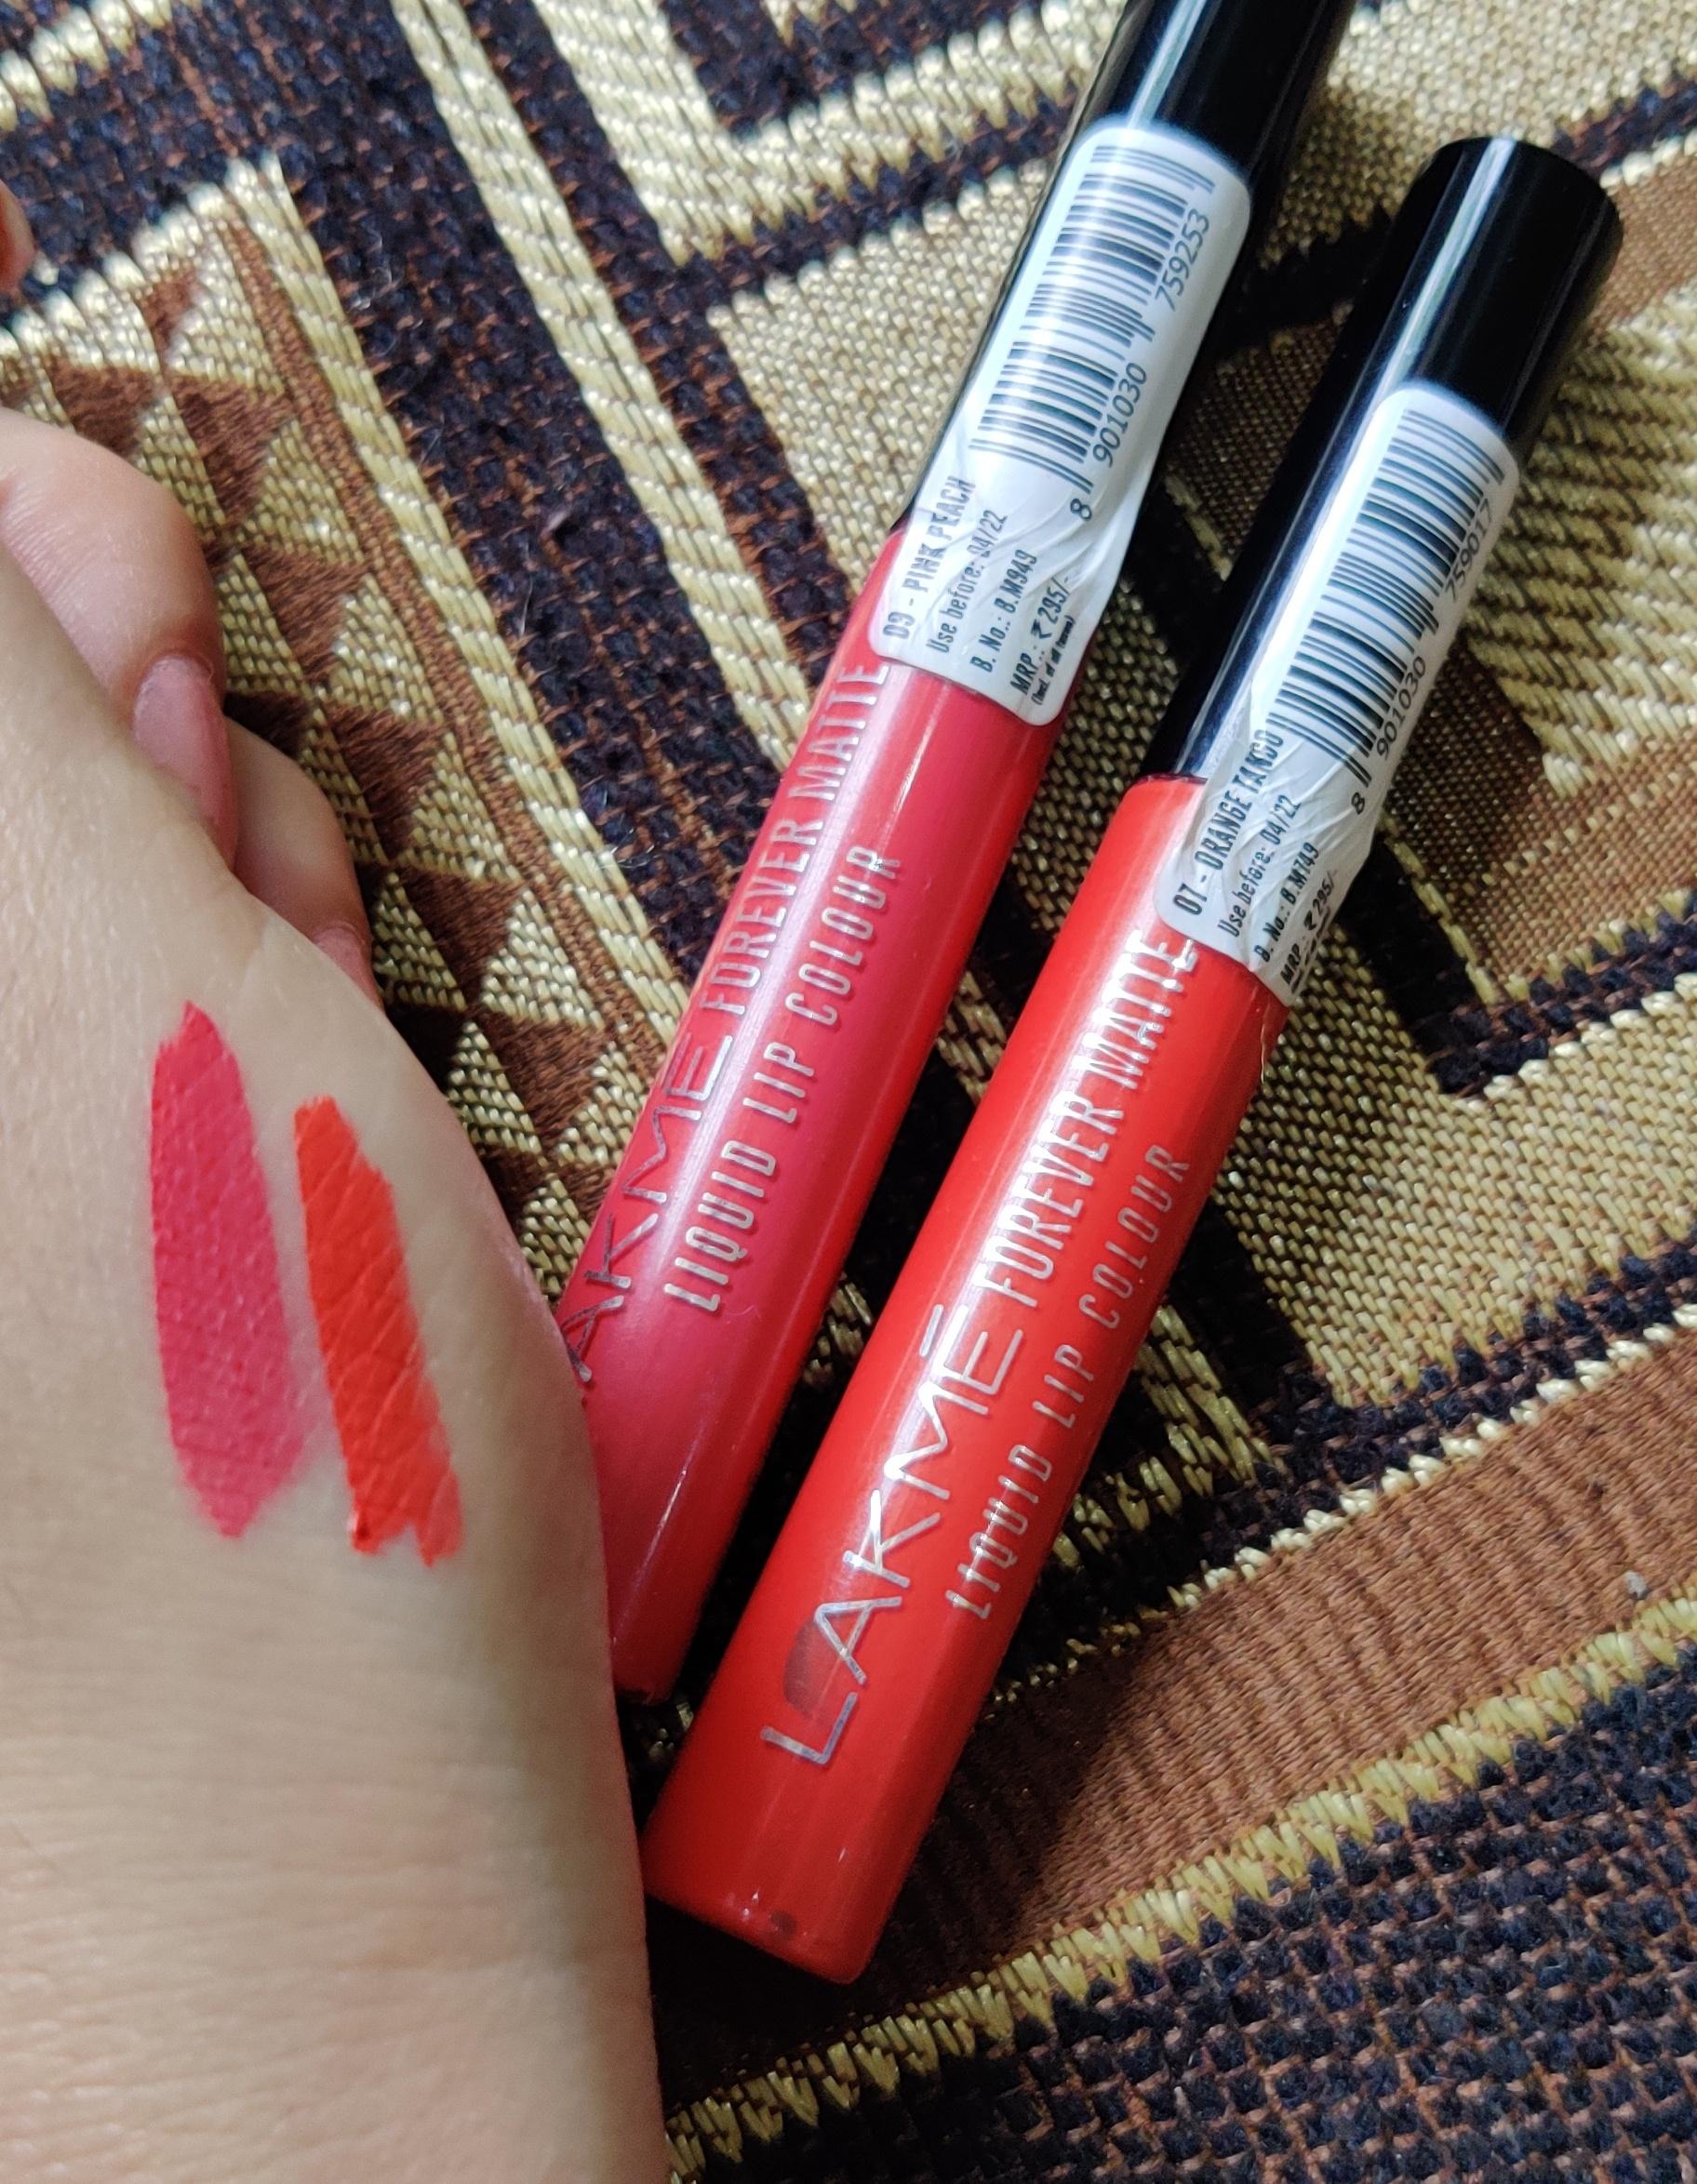 Lakme Forever Matte Liquid Lip Colour -AFFORDABLE MATTE LIPISTICS-By shruti_beautyblogger